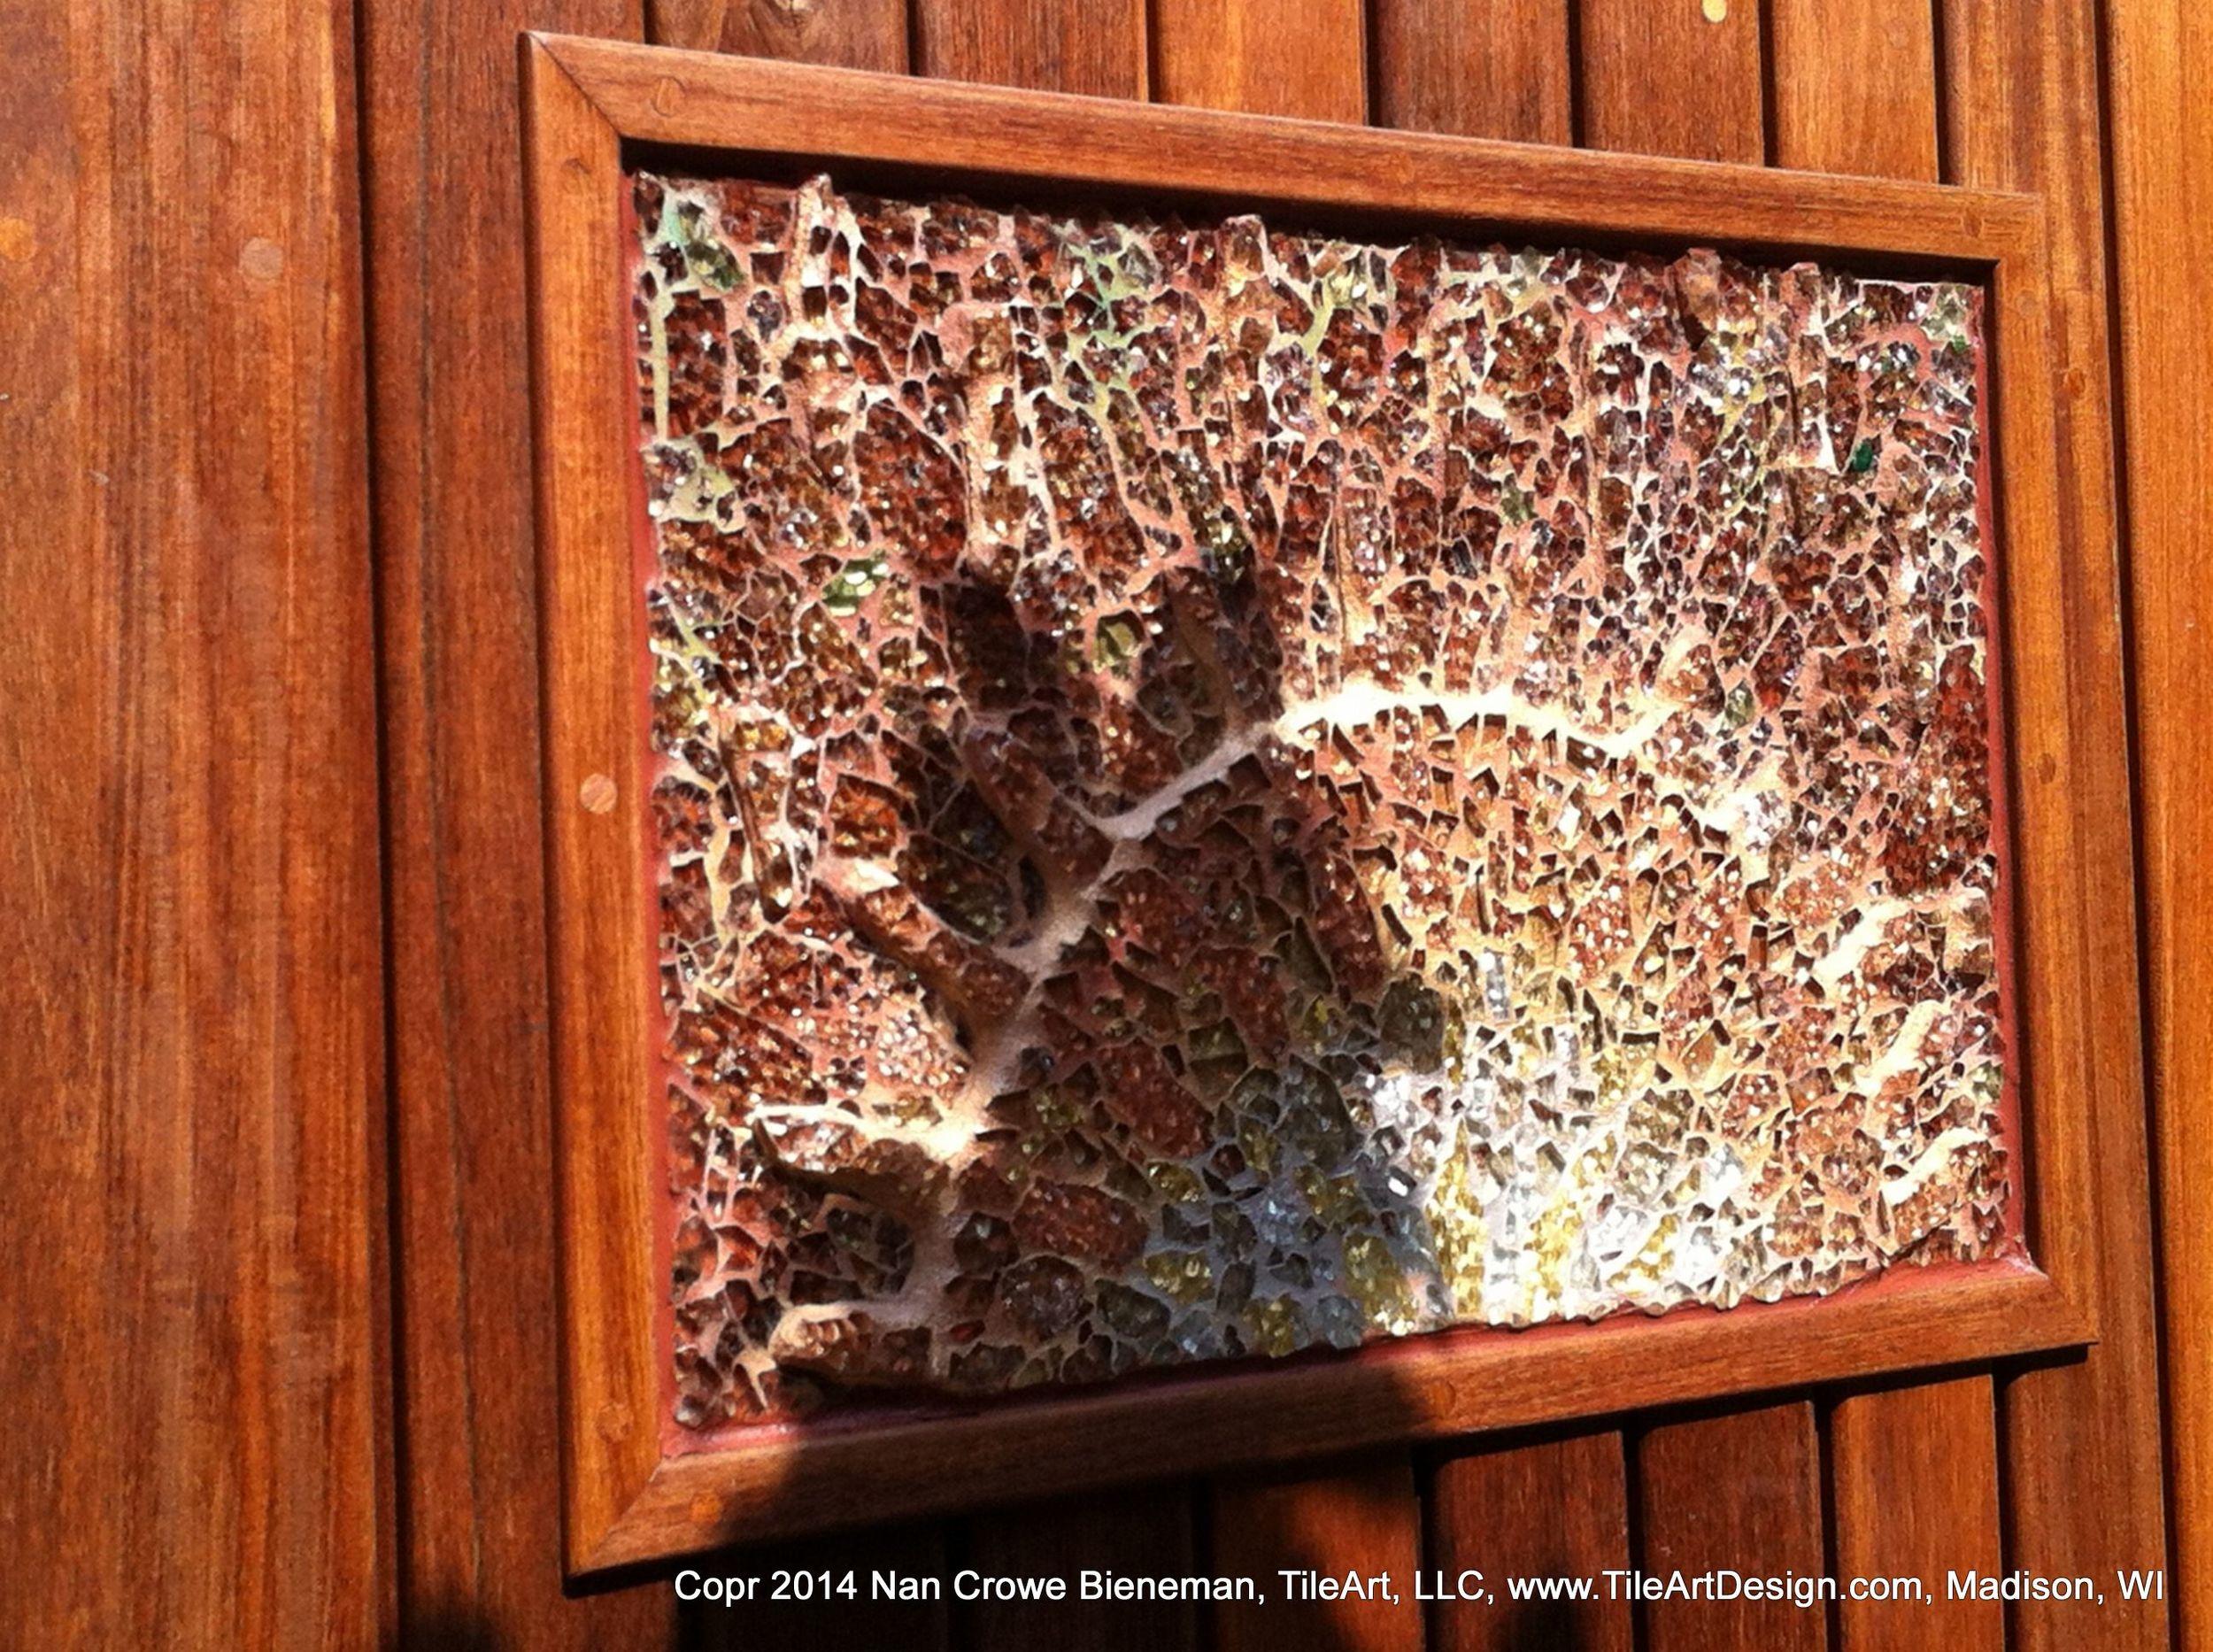 002-gate mosaic detail_1873.jpg